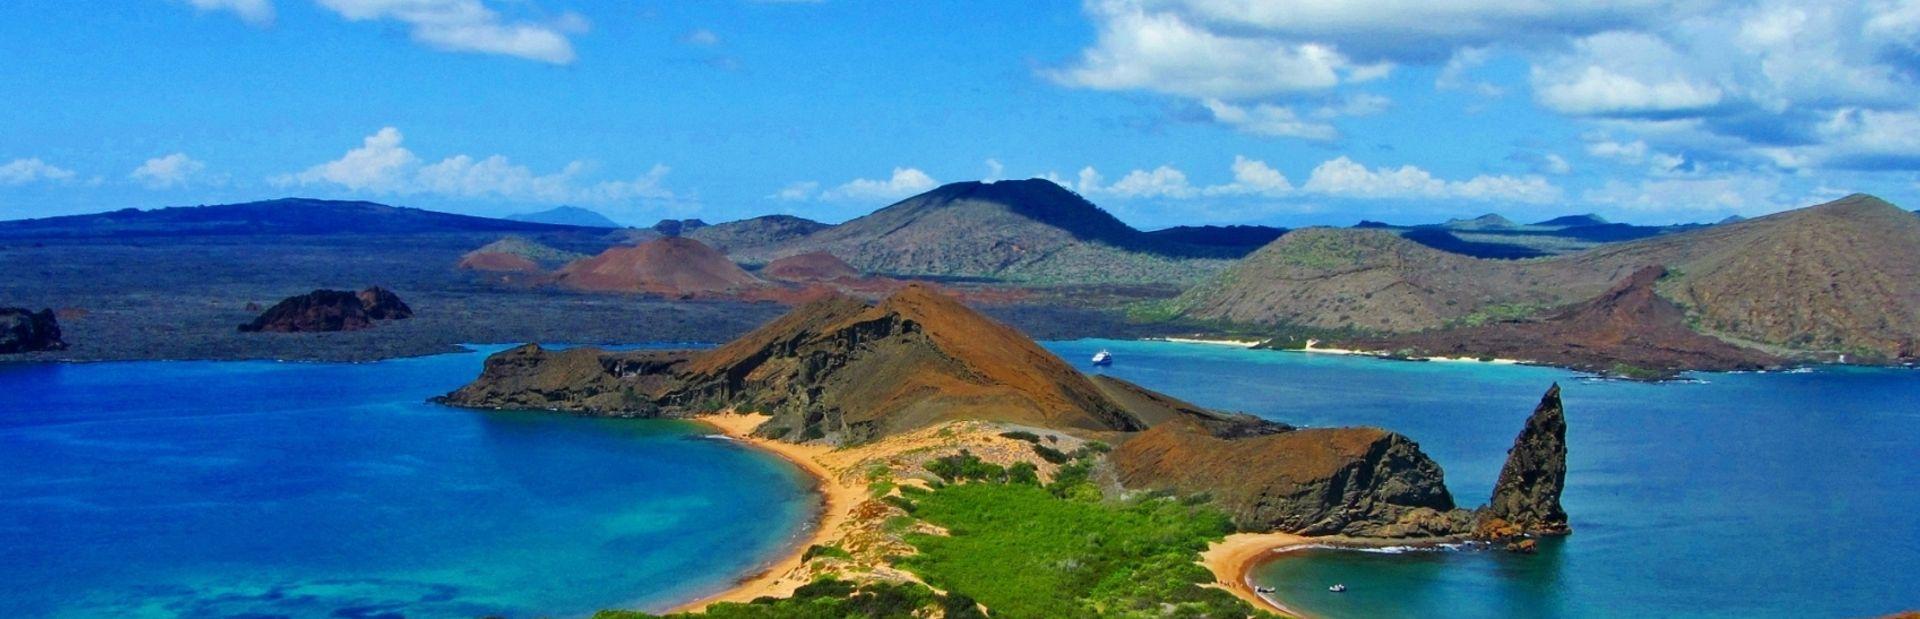 Galapagos Islands guide